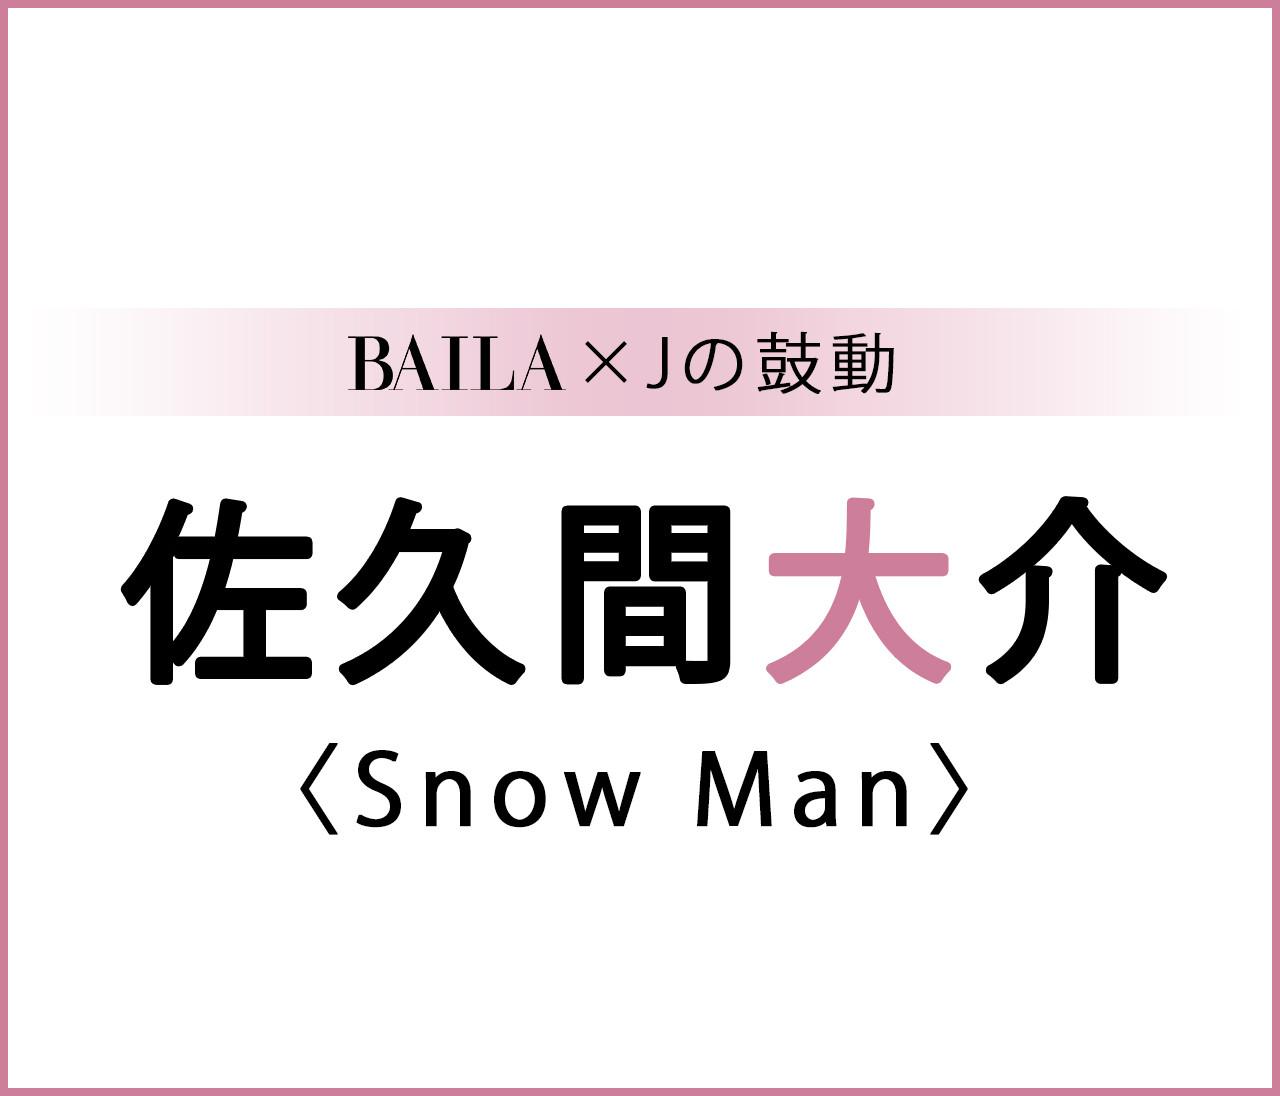 【 #SnowMan #佐久間大介 】佐久間大介スペシャルインタビュー!【BAILA × Jの鼓動】